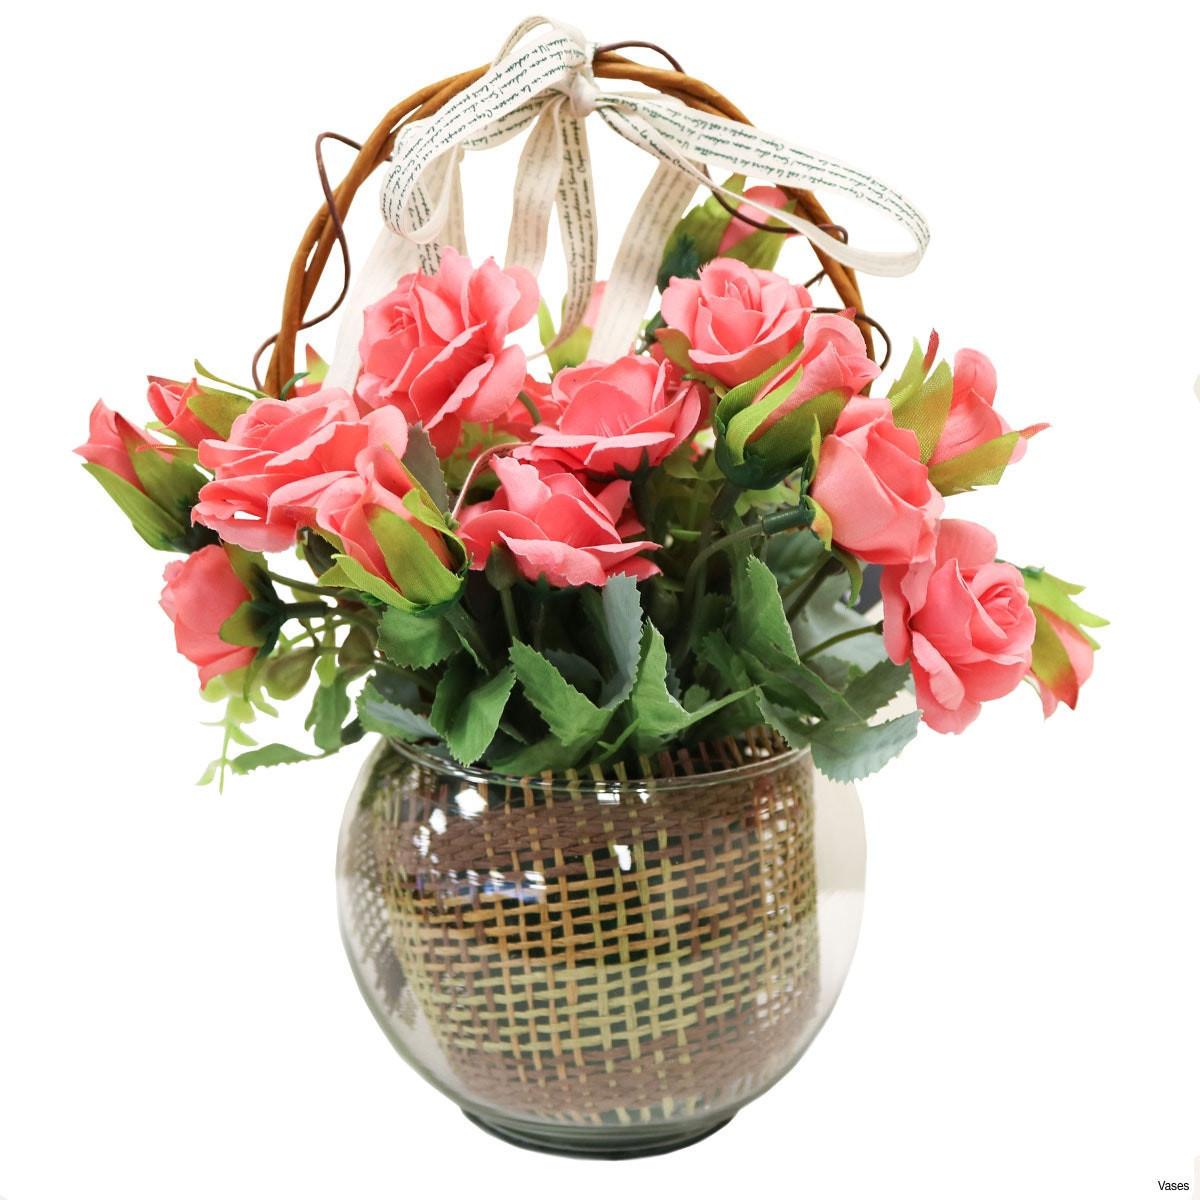 daum daffodil vase of yellow glass vase images bf142 11km 1200x1200h vases pink flower with bf142 11km 1200x1200h vases pink flower vase i 0d gold inspiration